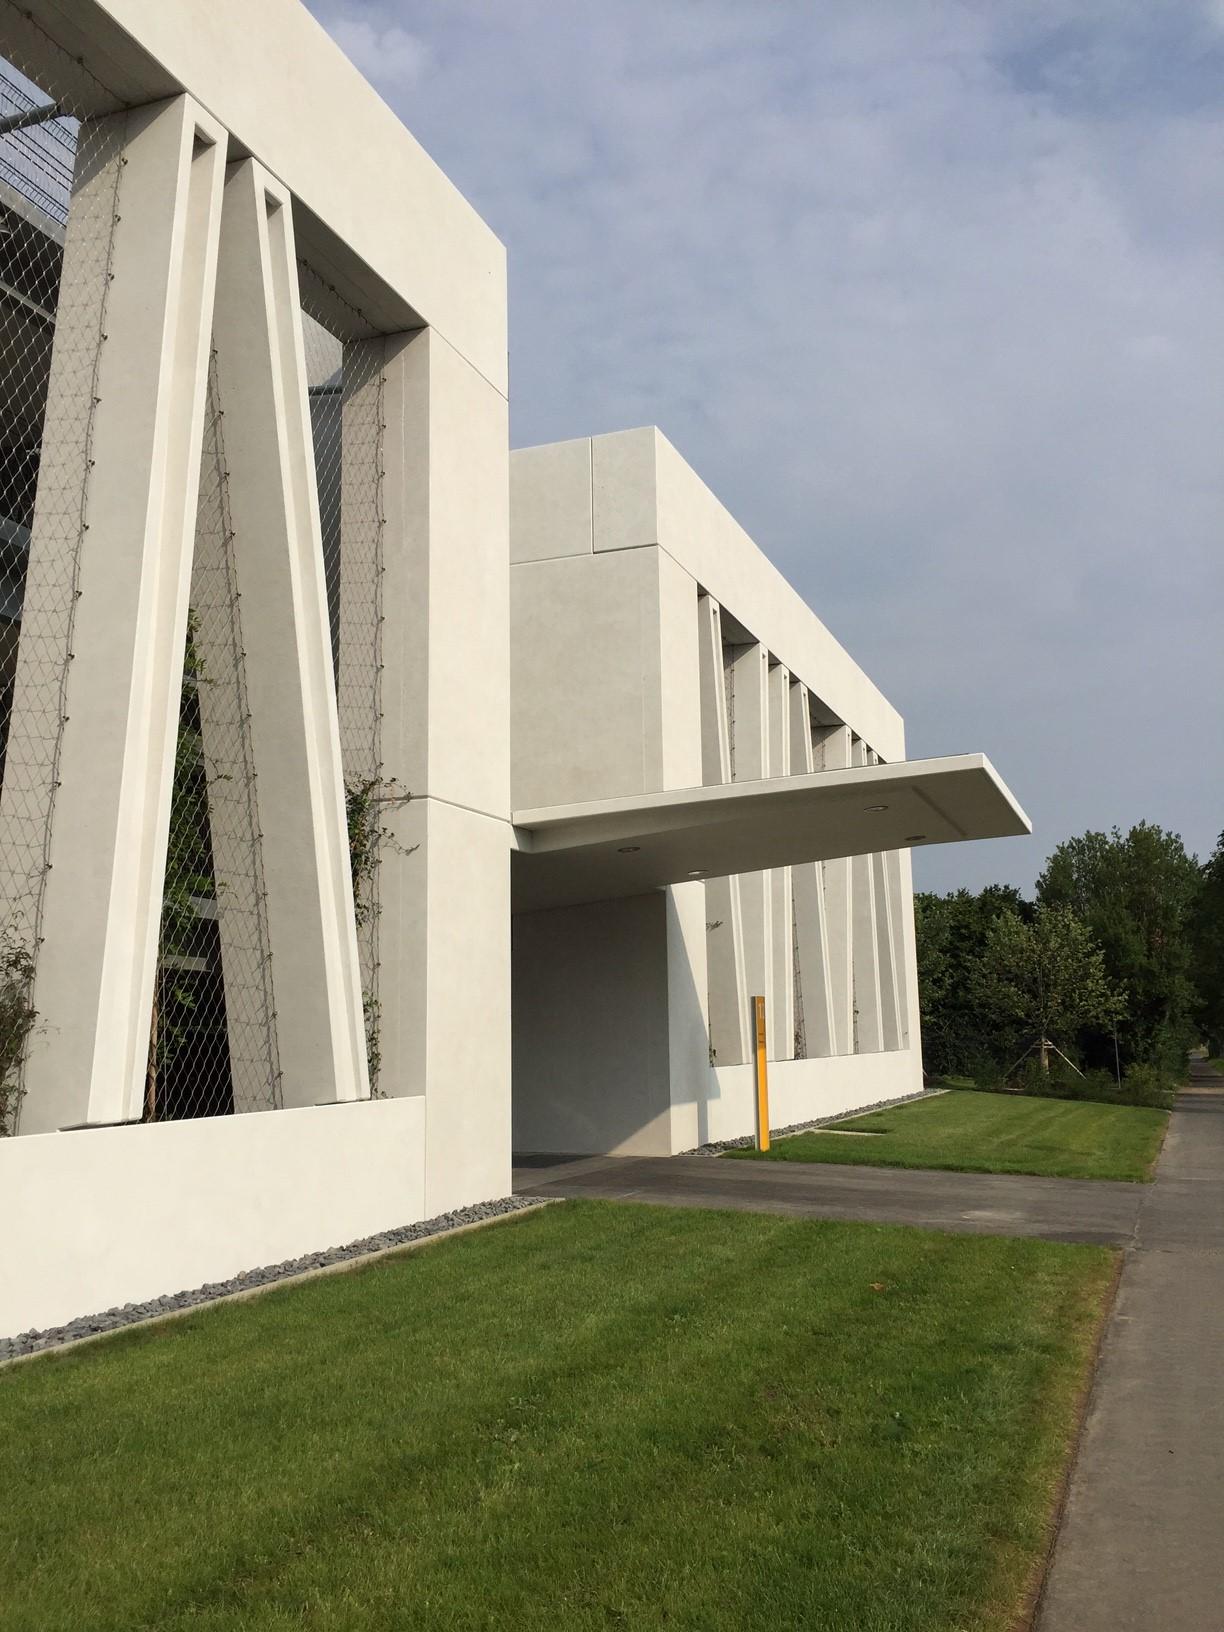 Parkhaus Sartorius, Göttingen